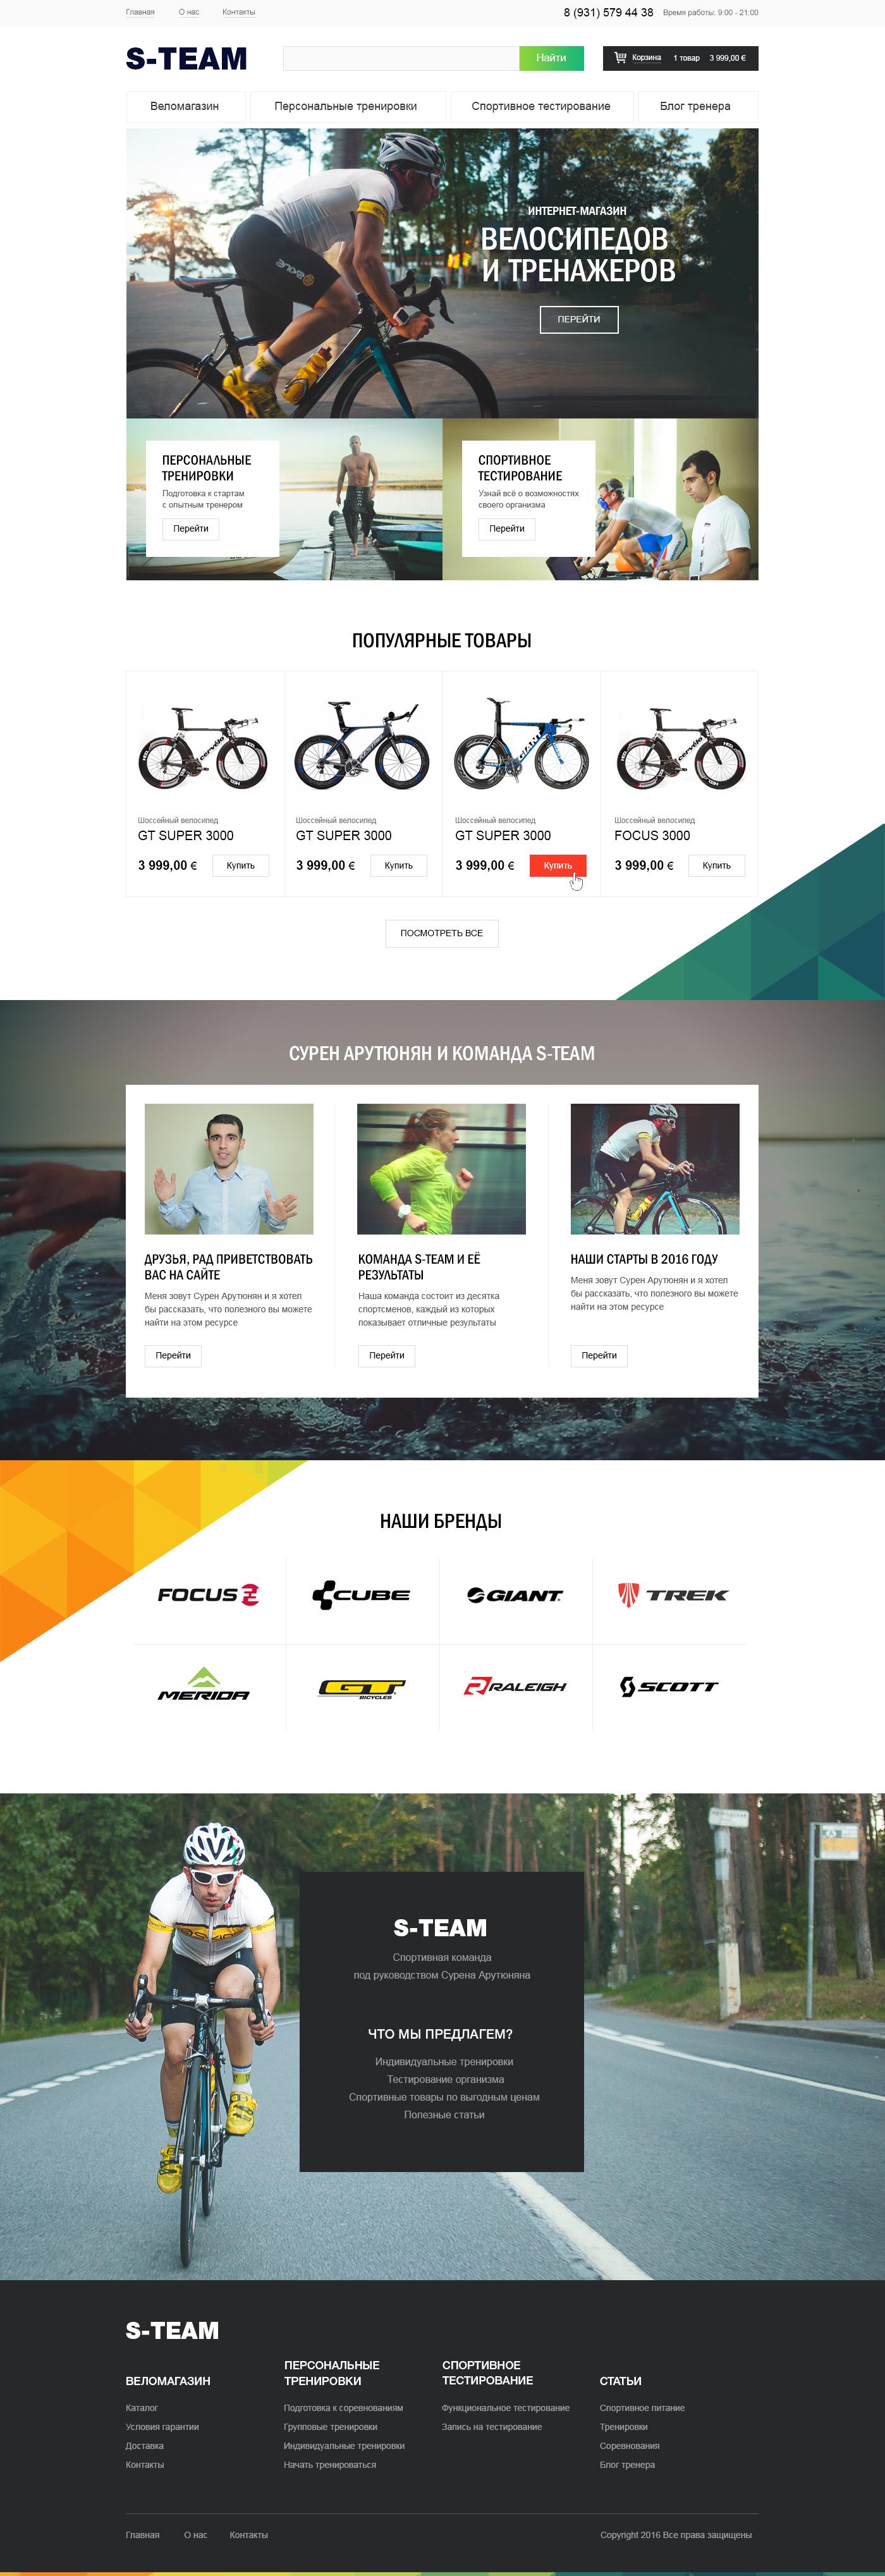 Сайт для спортивной команды